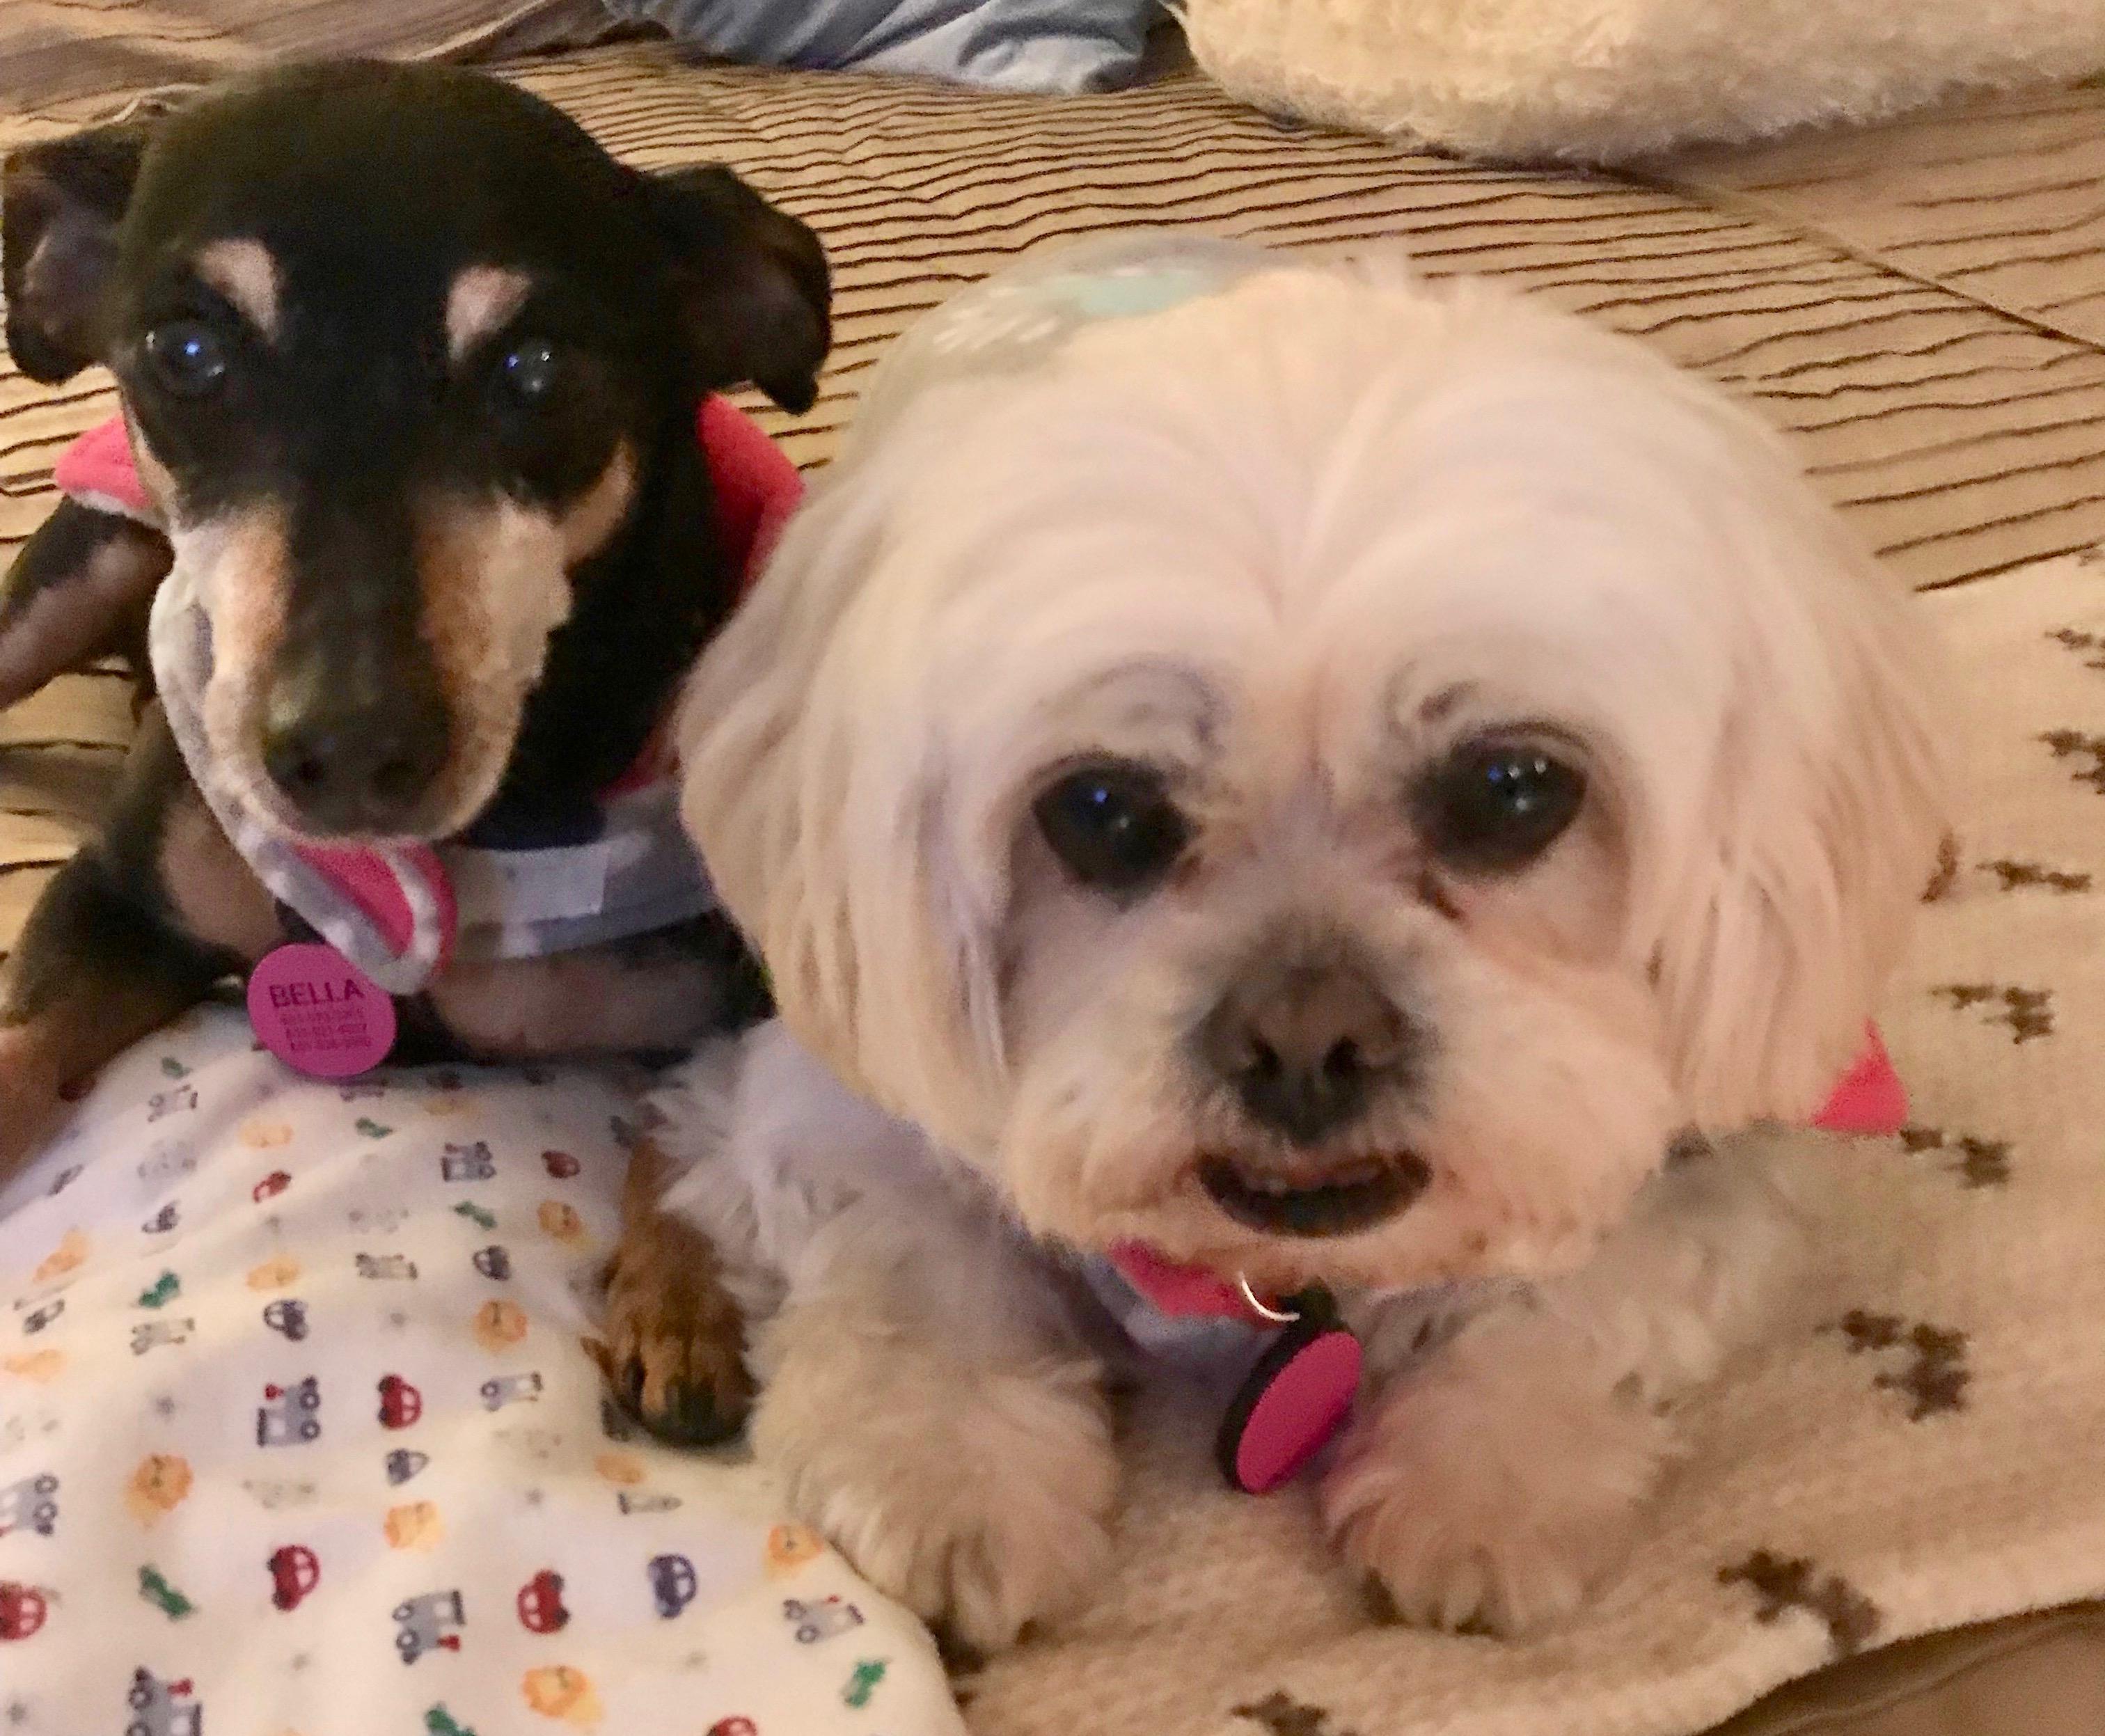 Bella and Daisy